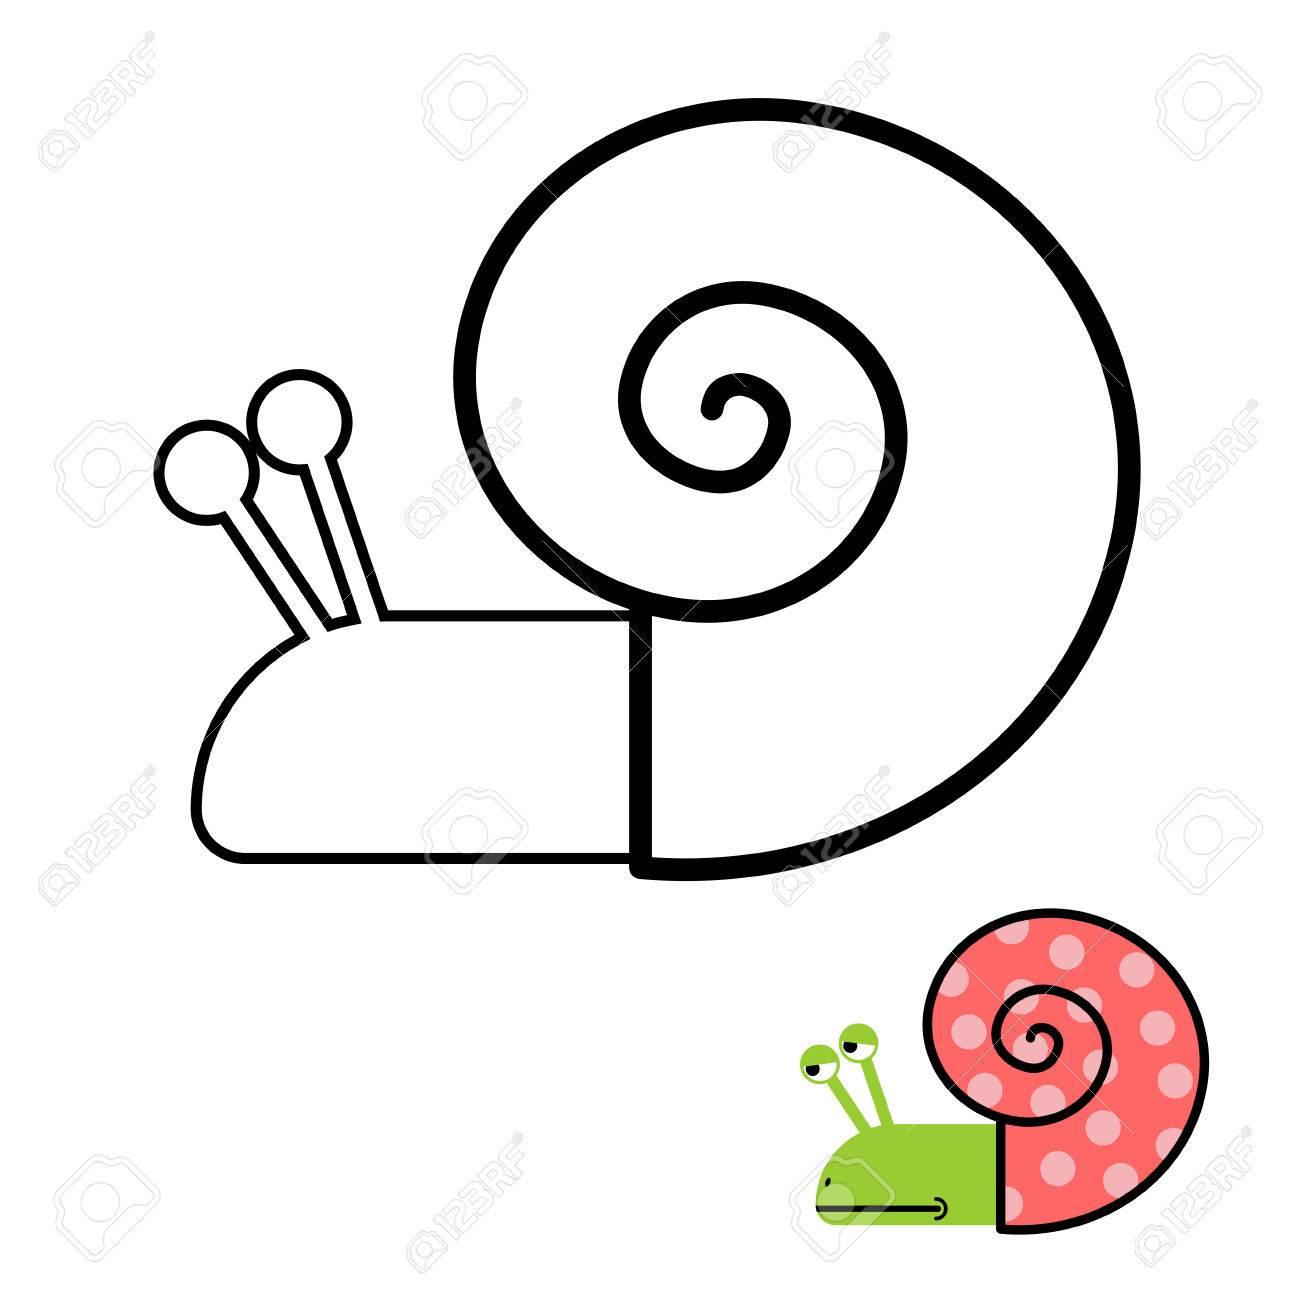 Libro Para Colorear Caracol. Almeja Gastropoda Con Concha En Espiral ...